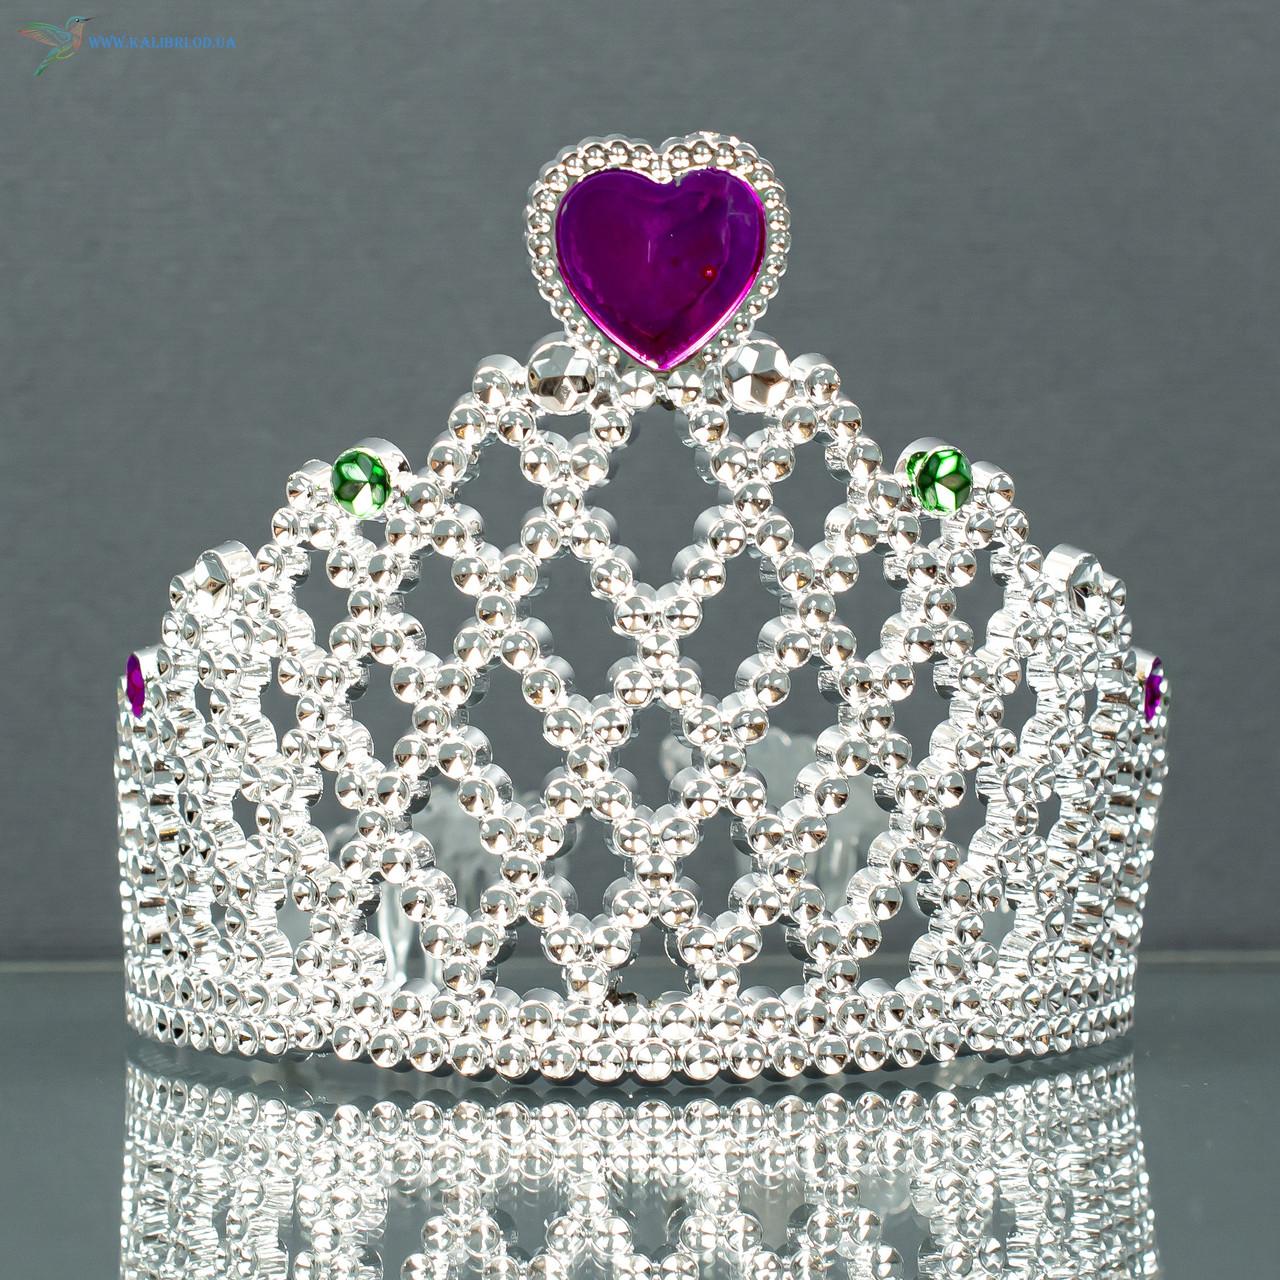 Карнавальная корона Праздник ТЛ-05